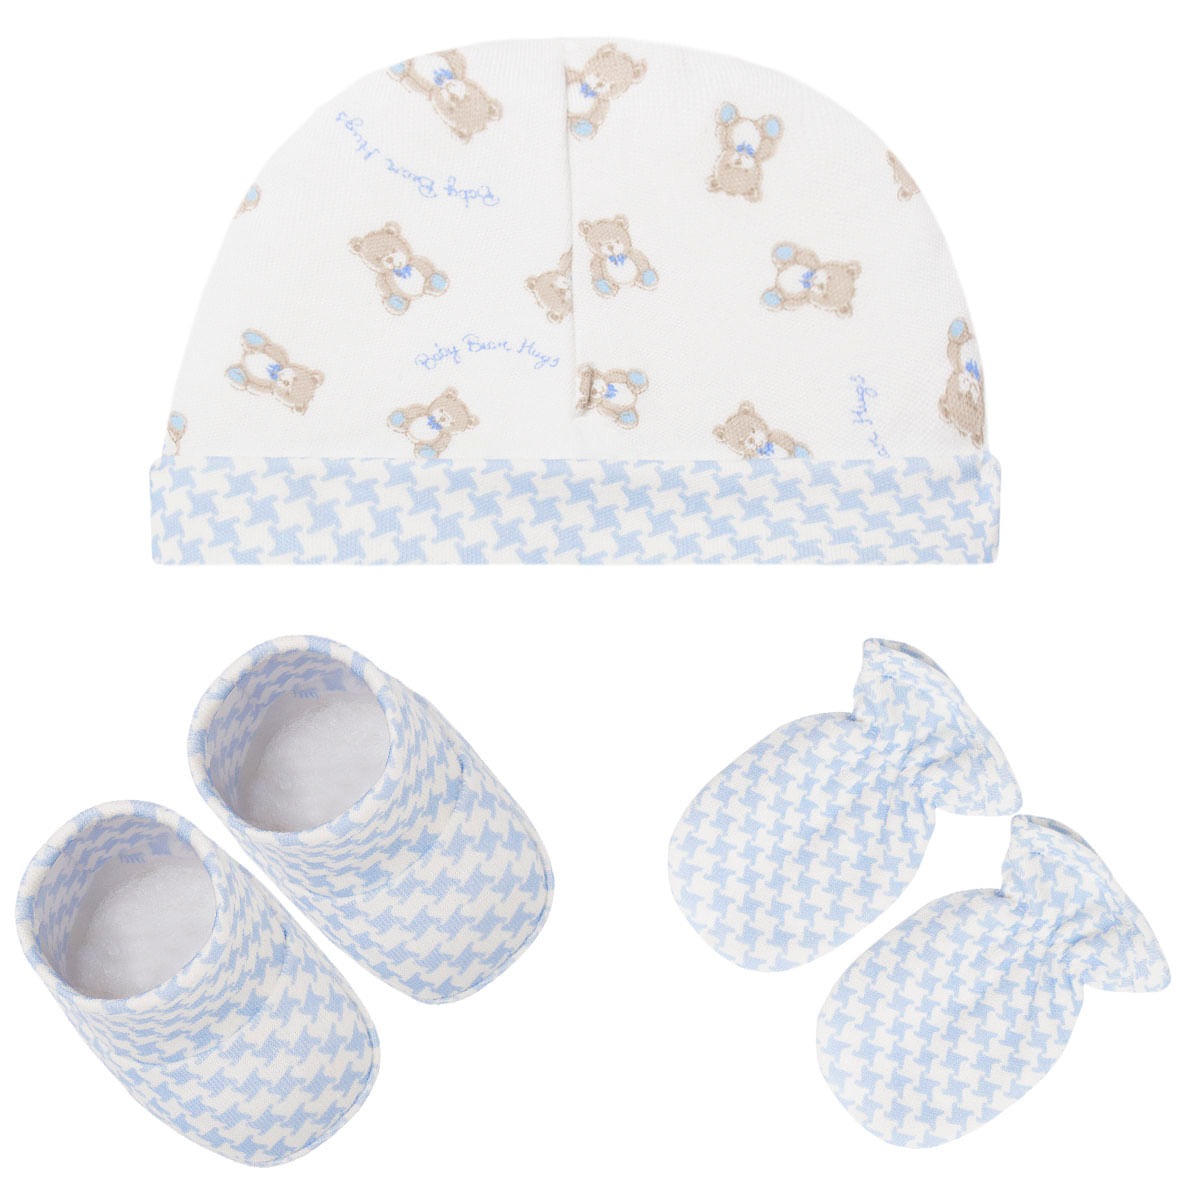 cd4decb2f7bad4 Kit c/ Touca, Luva e Sapatinho para bebê em suedine Baby Bear Azul ...